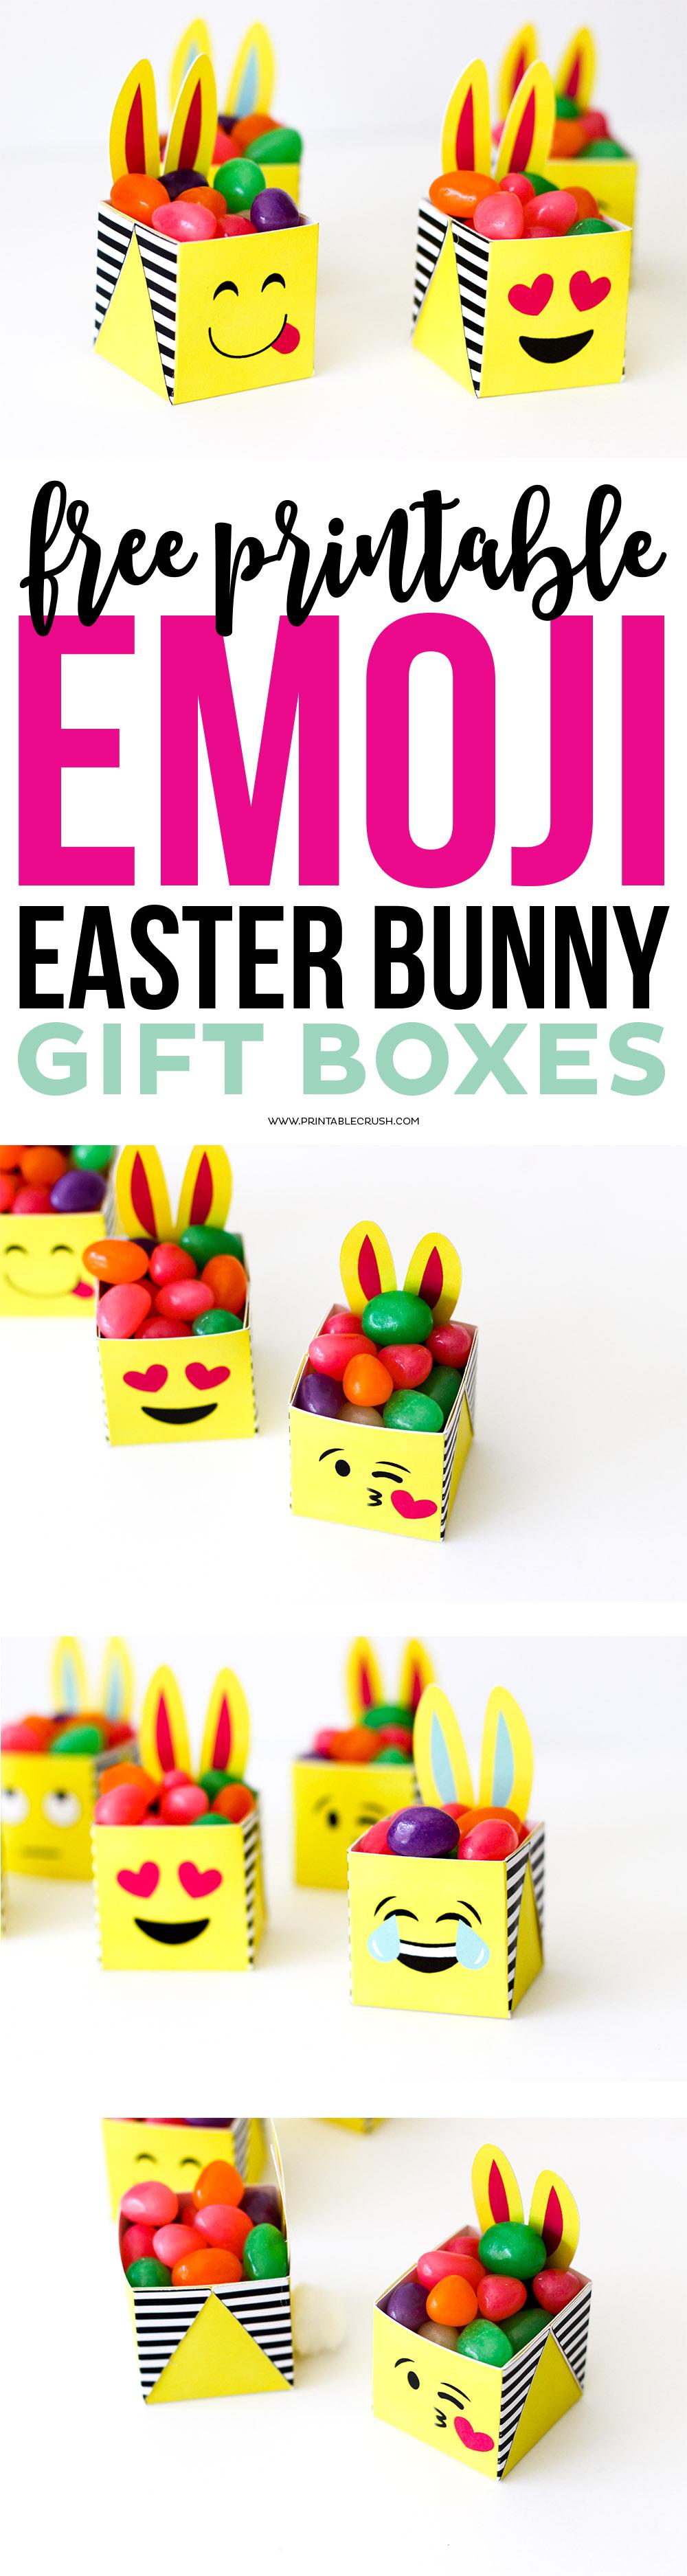 Easter emoji bunny boxes free printable printable crush long pin collage for easter emoji boxes negle Choice Image